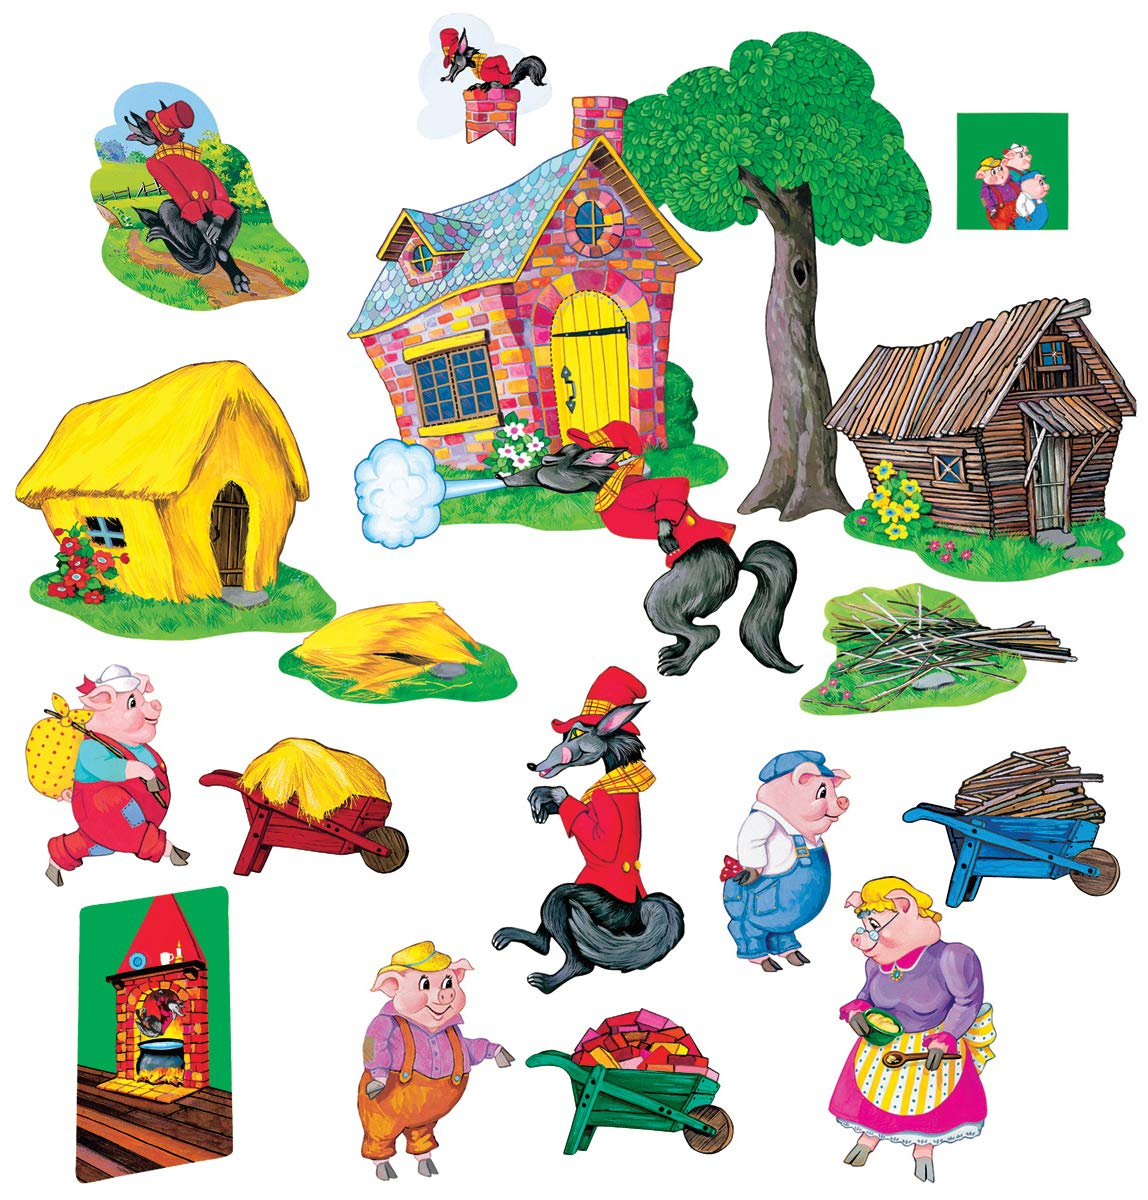 Little Folk Visuals Three Pigs Basic Precut Flannel/Felt Board Figures, 20 Pieces Set by Little Folk Visuals